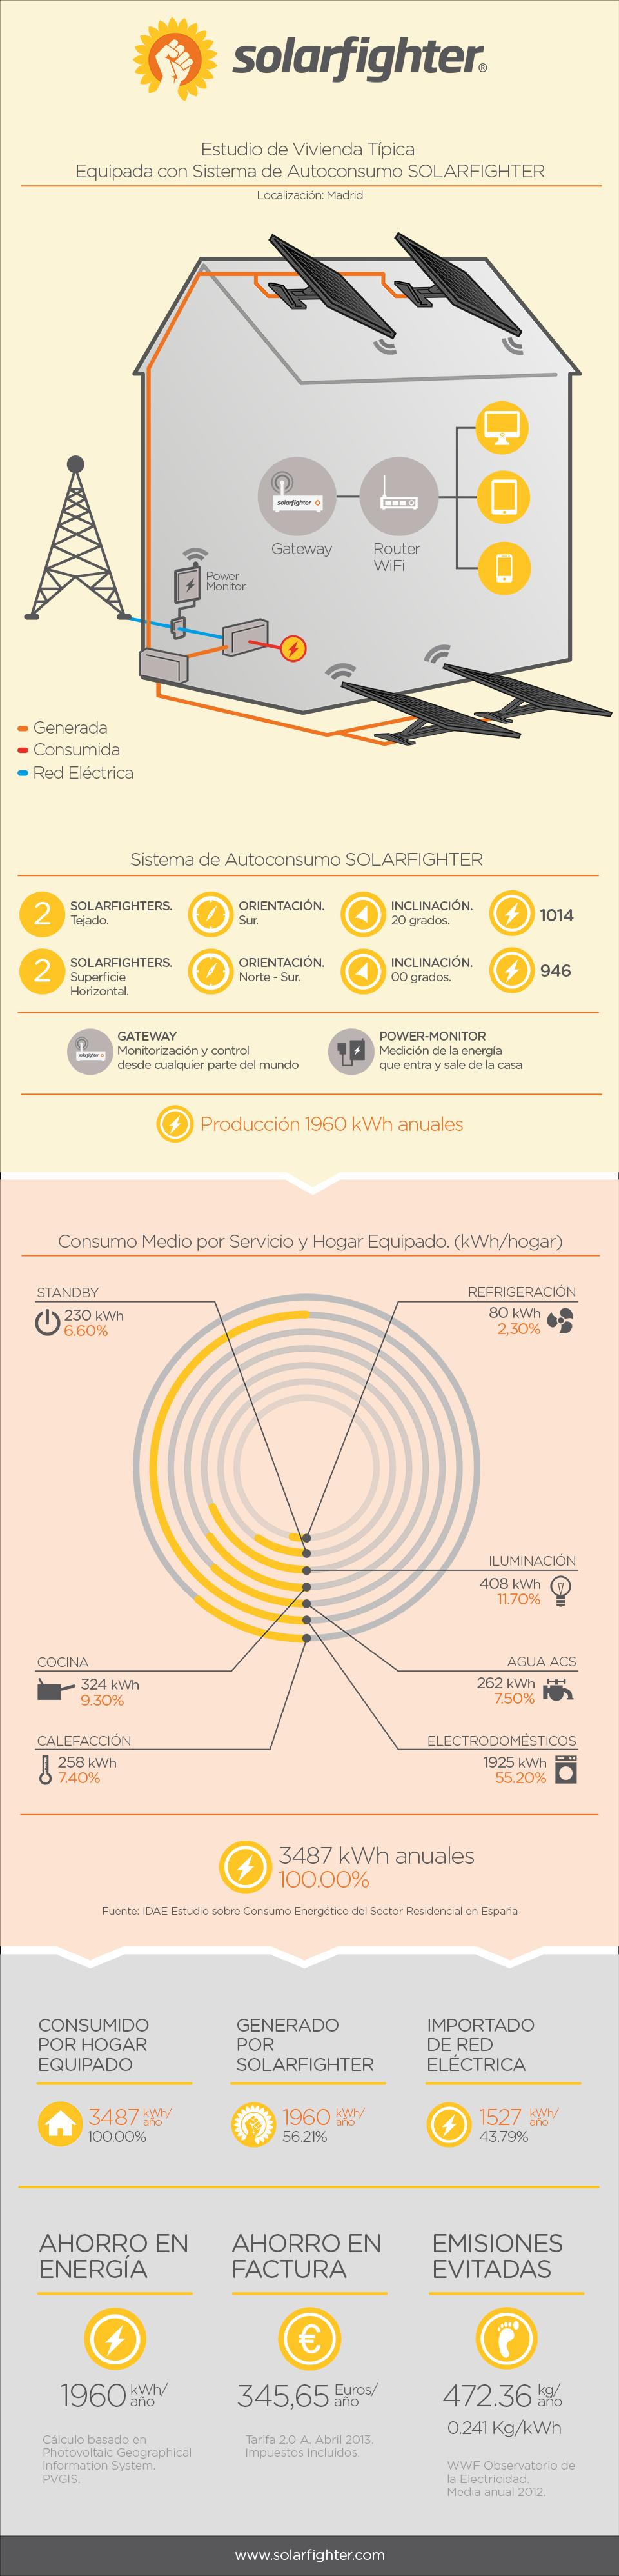 infografia solarfighter autoconsumo - blog de efimarket